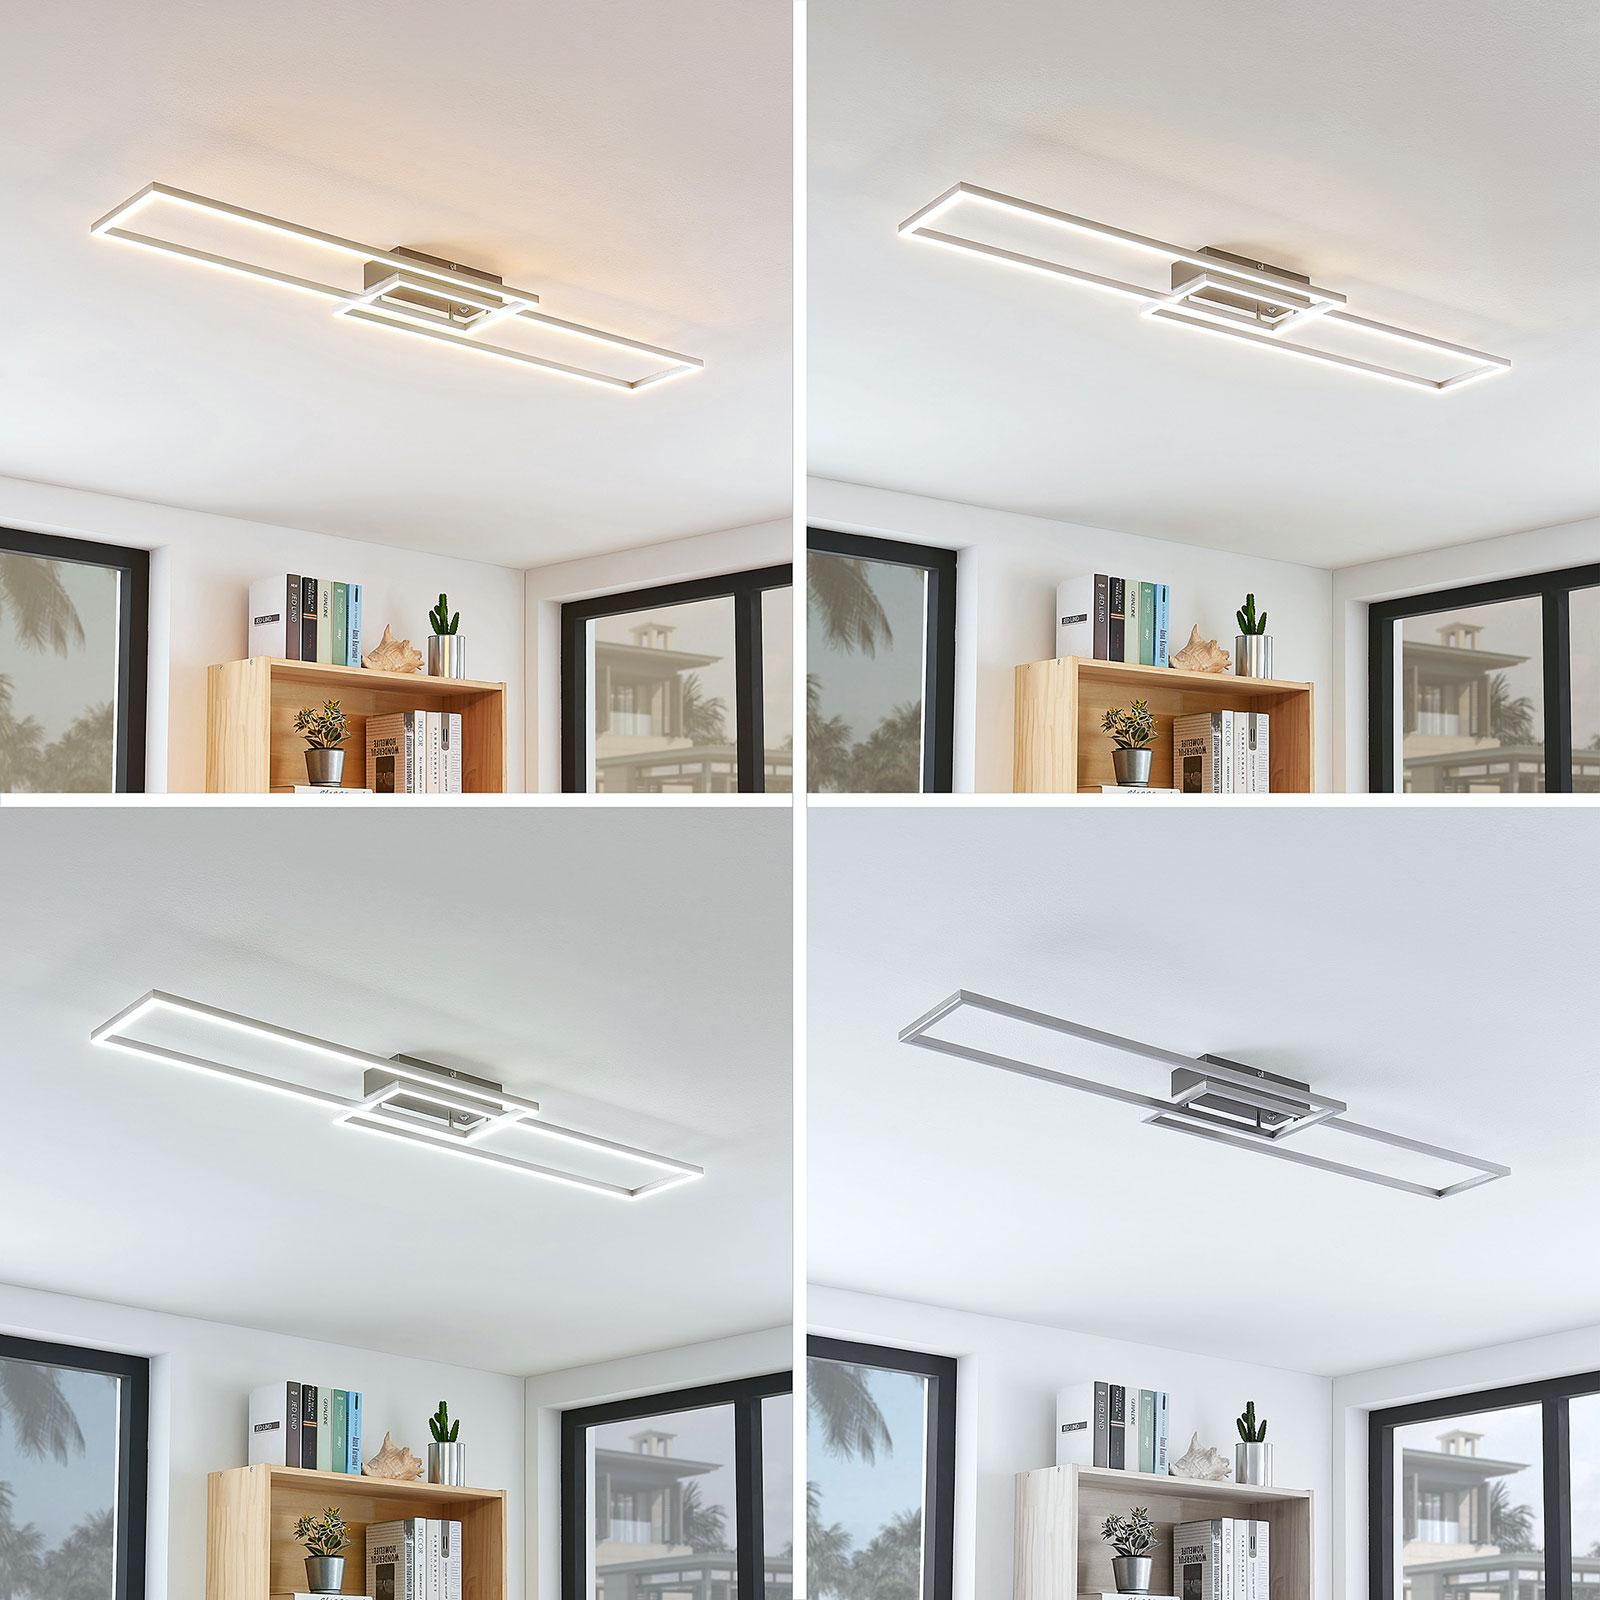 Plafonnier LED Quadra, dimmable, 2 lampes, 110cm